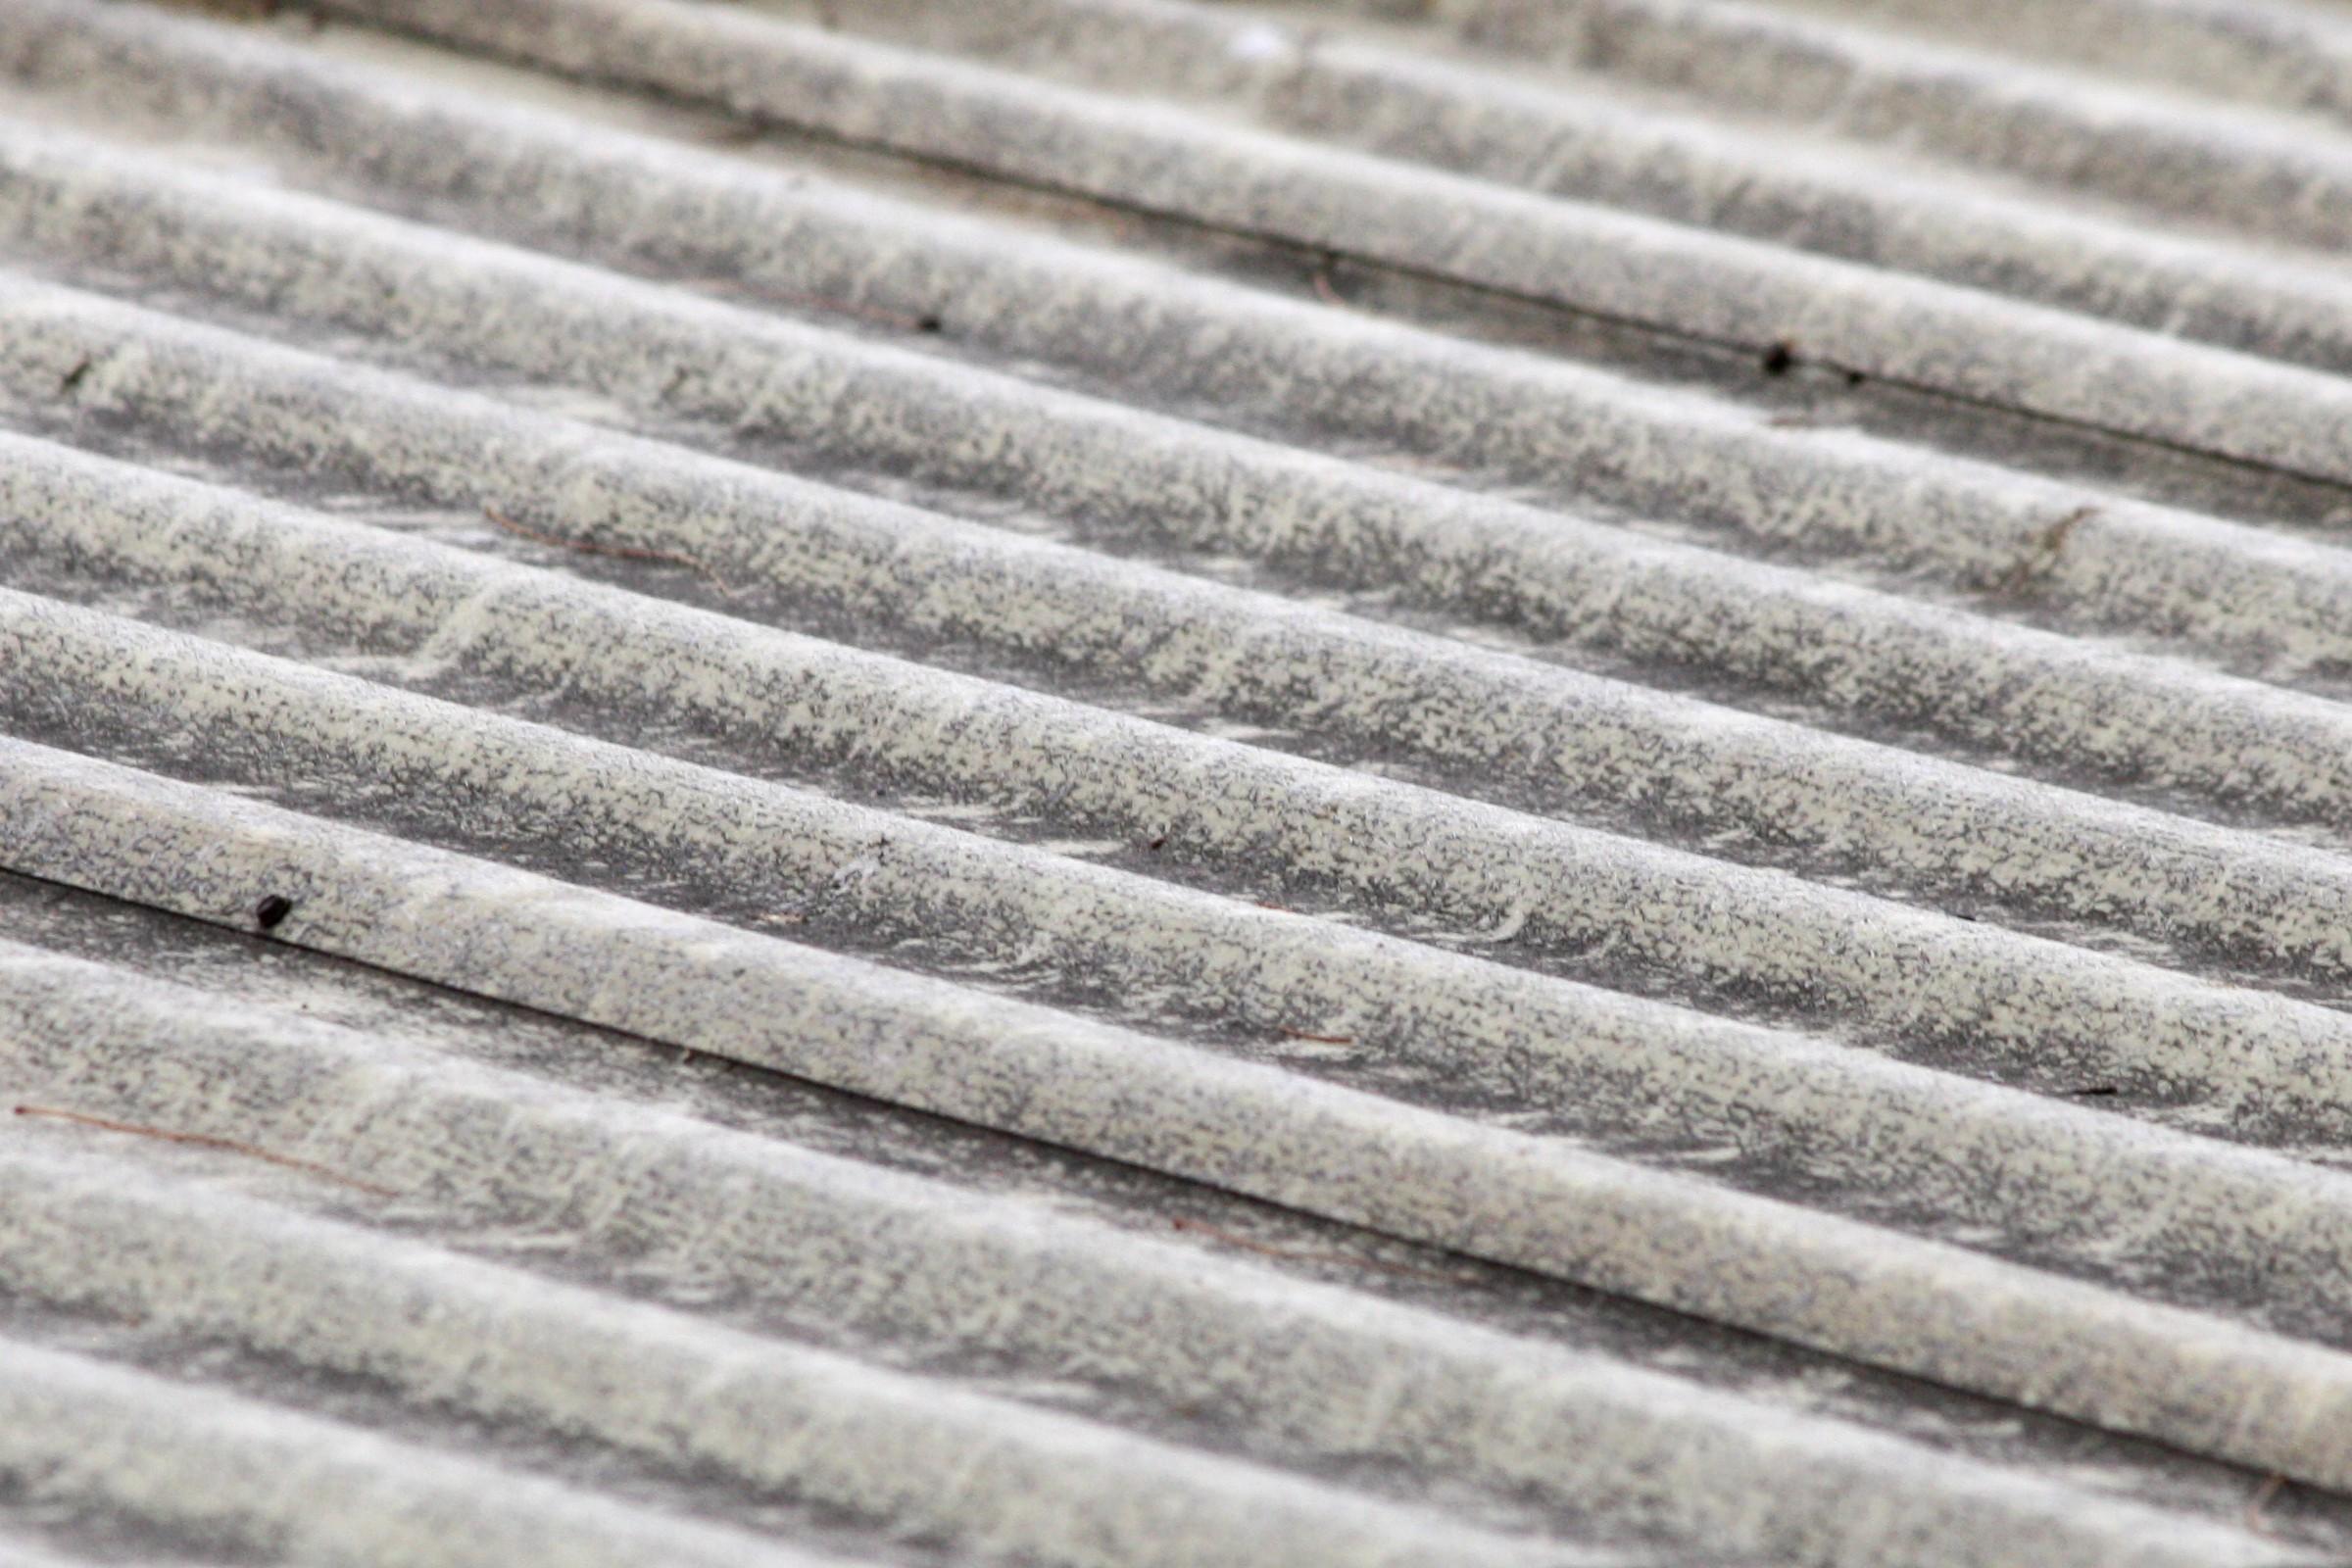 Corrugated Fiberglass Greenhouse Roof Texture Picture